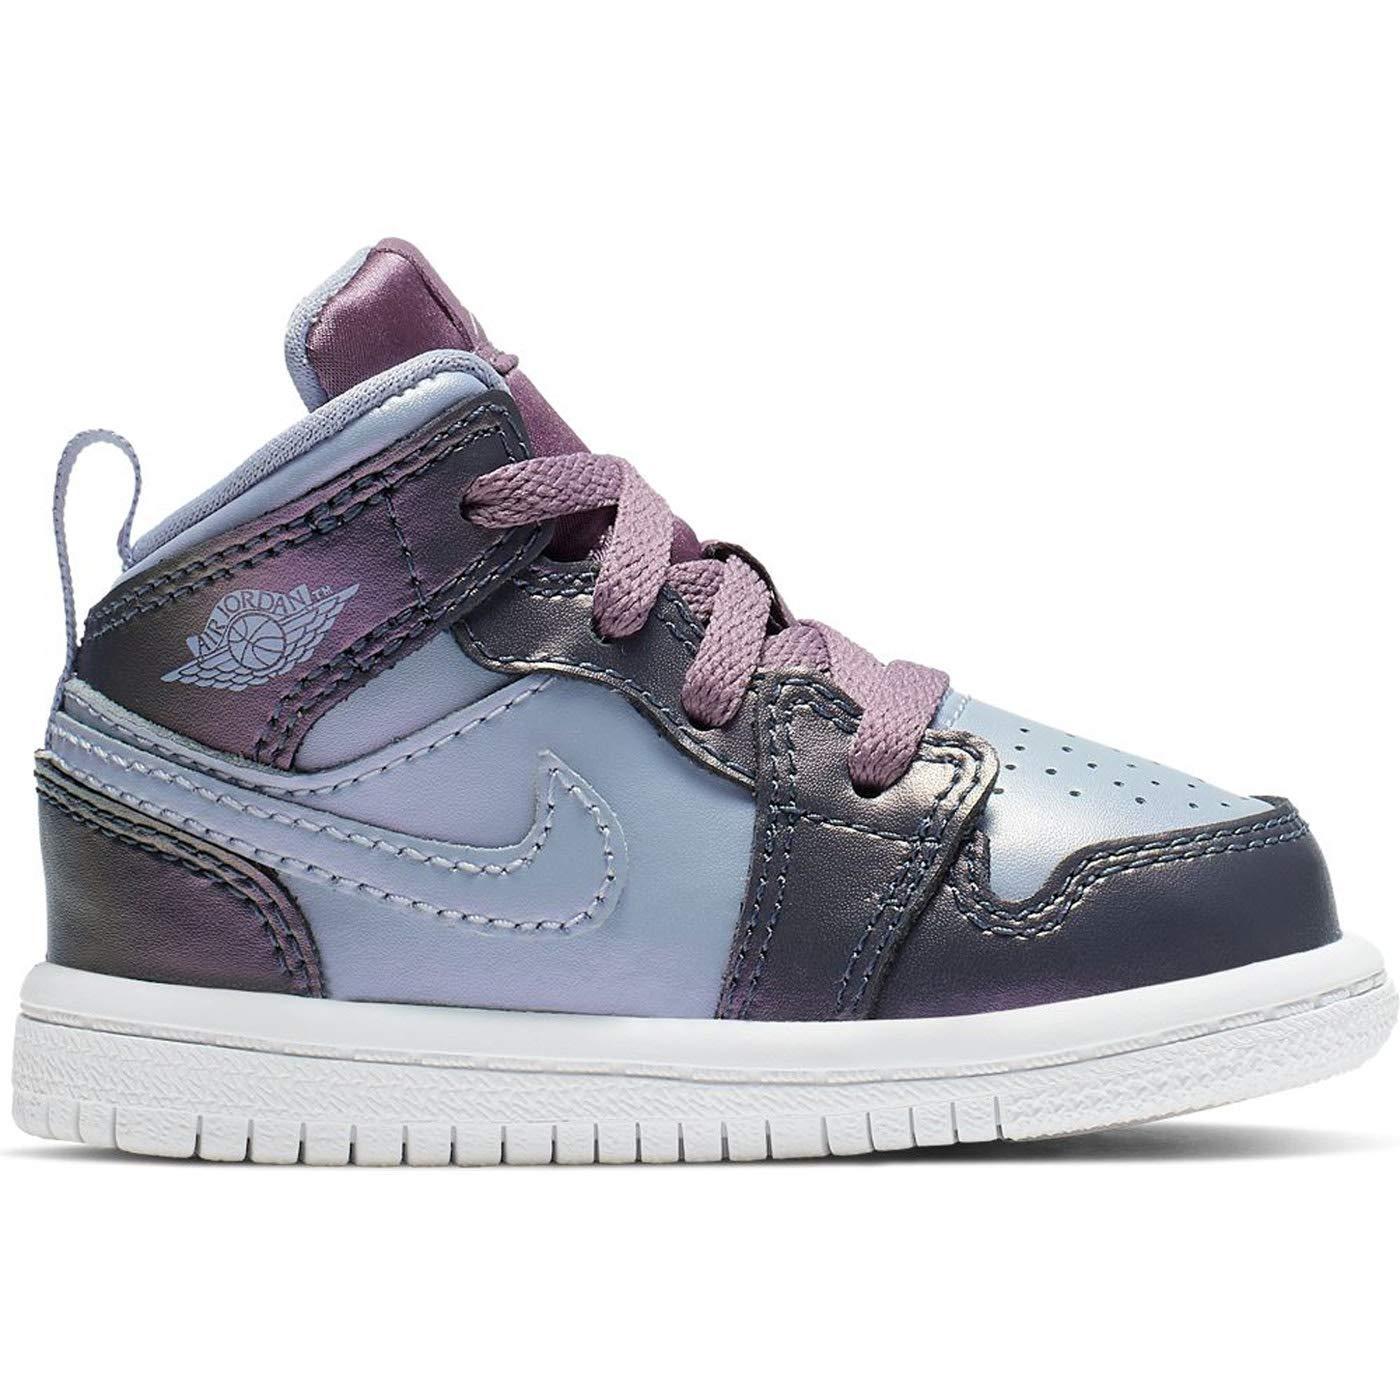 sale retailer 46030 488bc Amazon.com   Nike Jordan 1 Mid Se (td) Toddler Av5172-400 ...